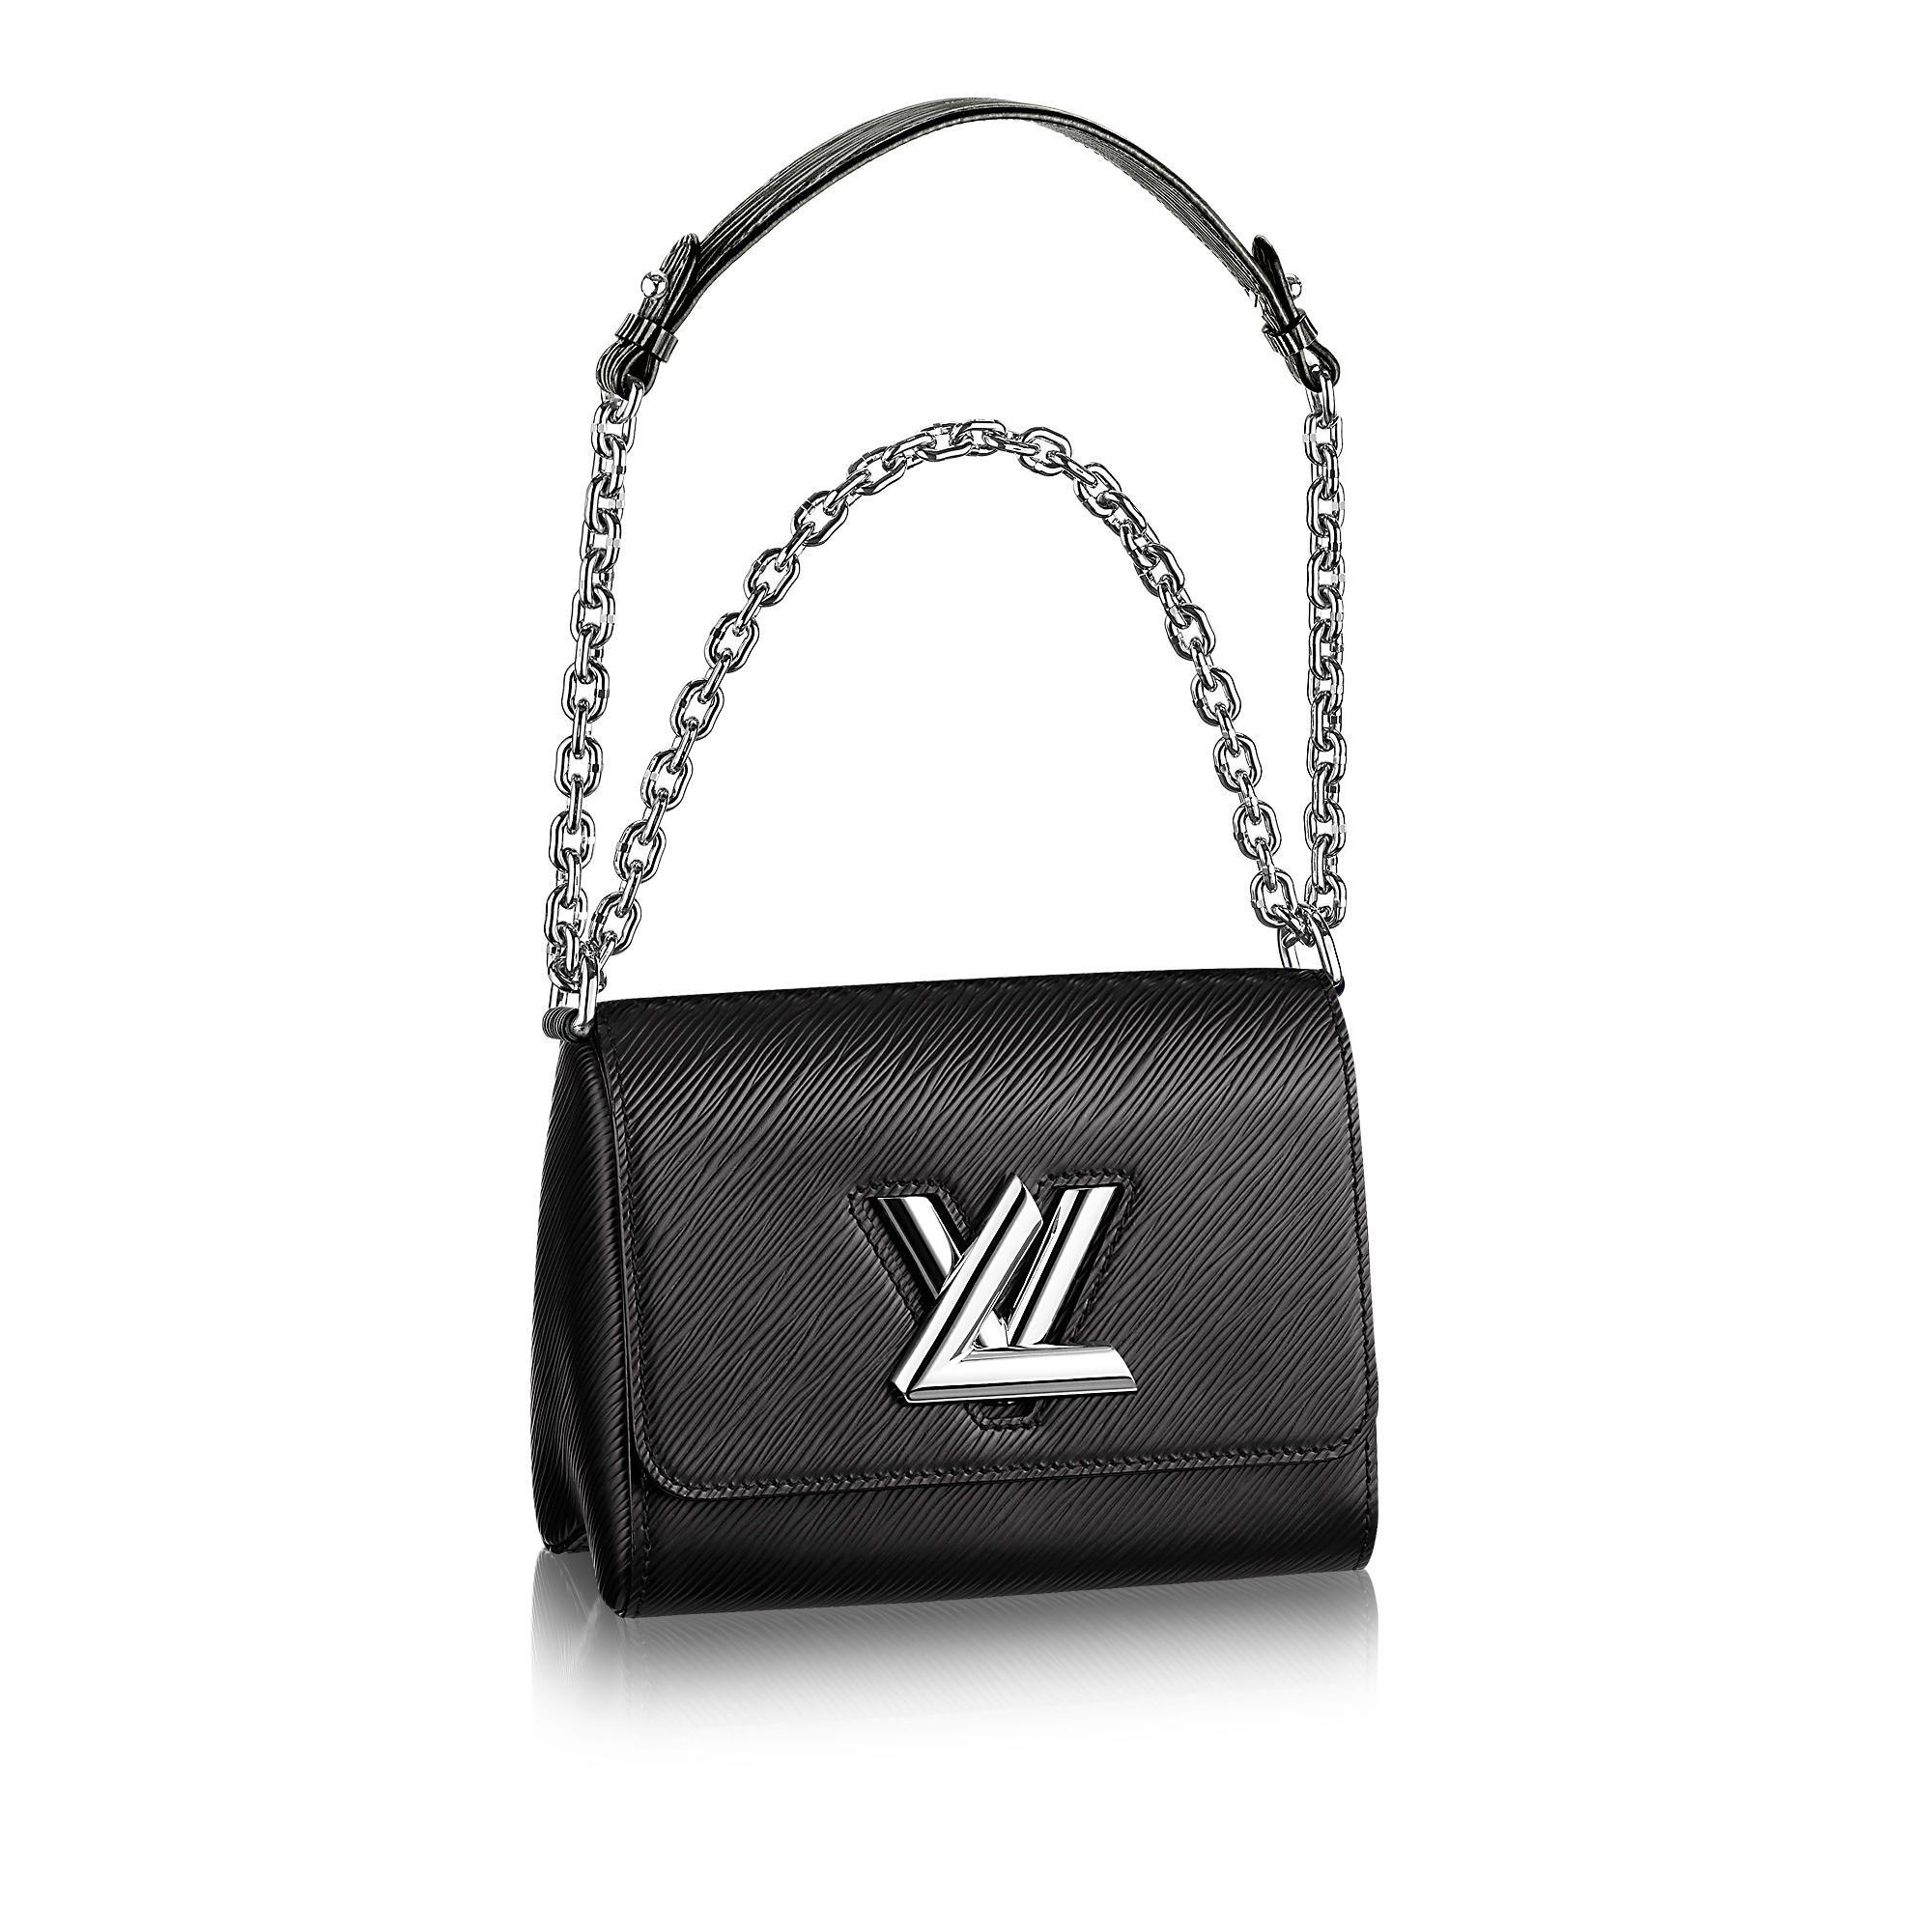 ff1aa9b33f Louis Vuitton Twist Bag  How to Wear